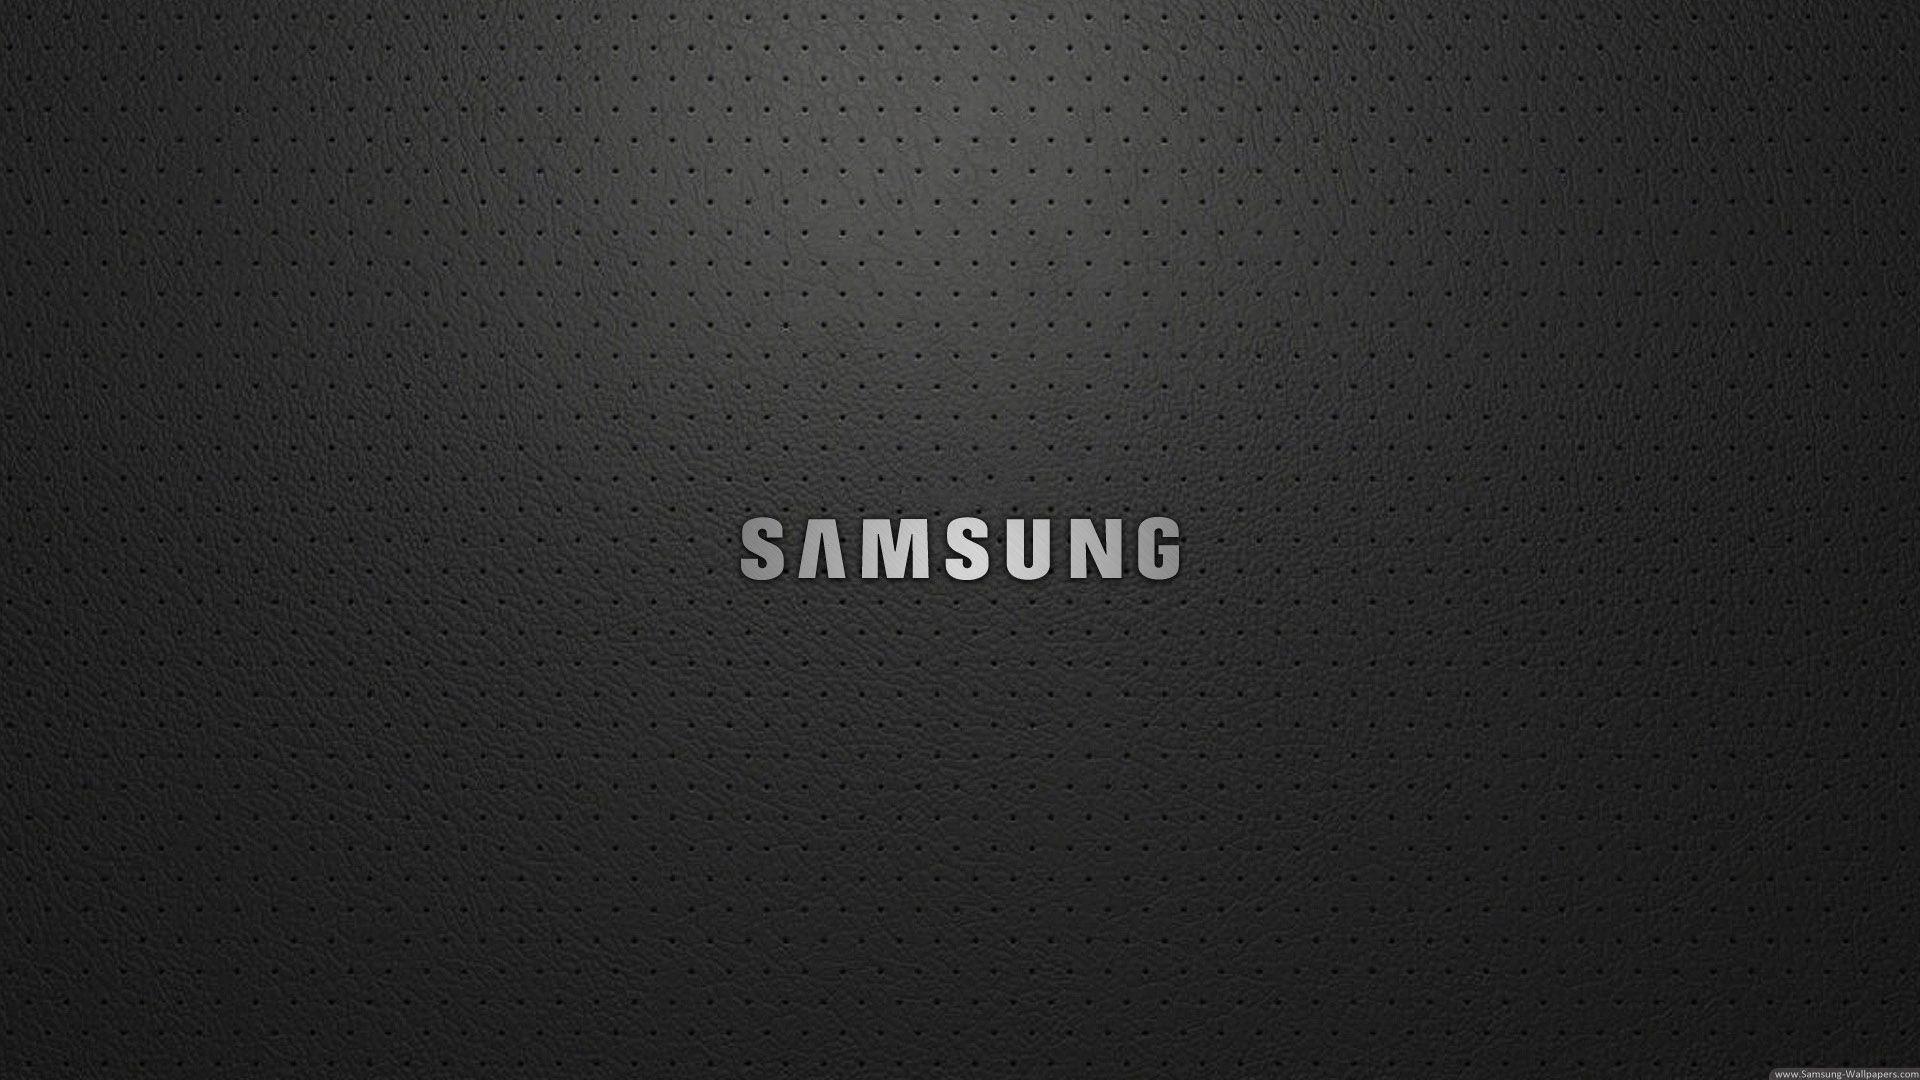 Samsung galaxy s3 4k wallpaper